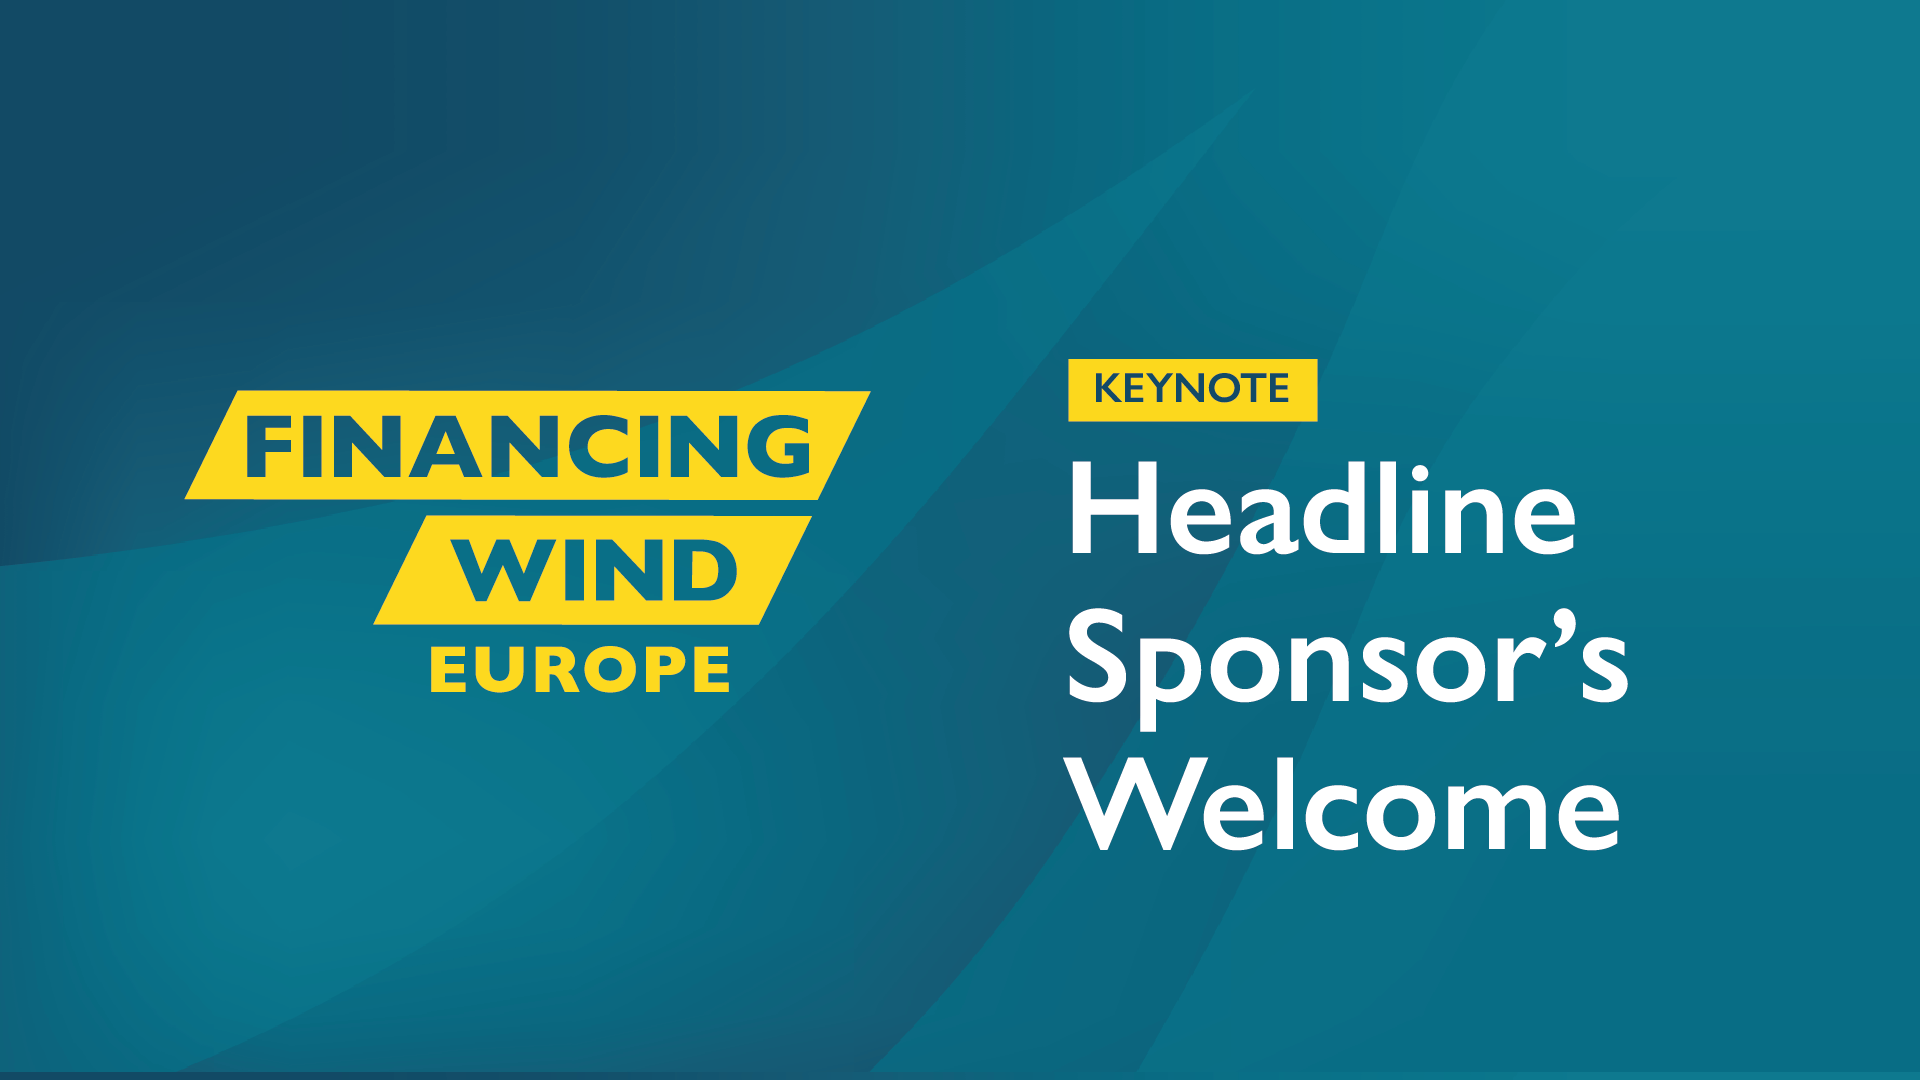 Financing Wind Europe - Headline Sponsor's Welcome